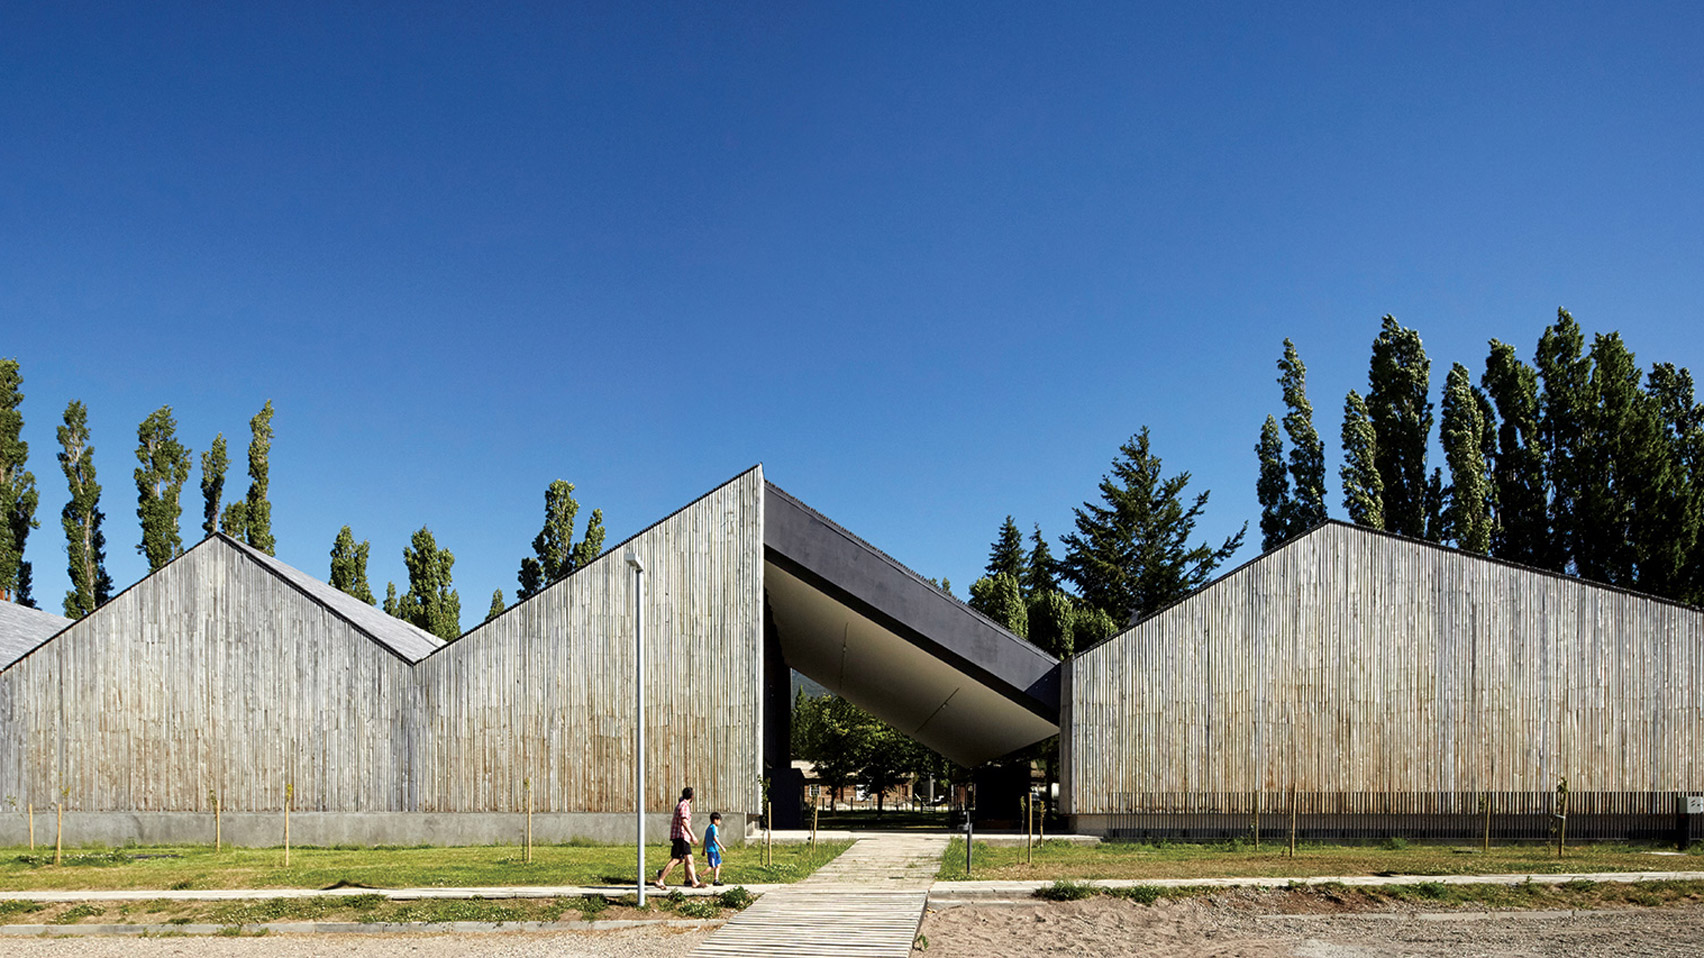 museo-regional-aysen-bbats-tirado-arquitectos-cristobal-palma-PRINCIPAL